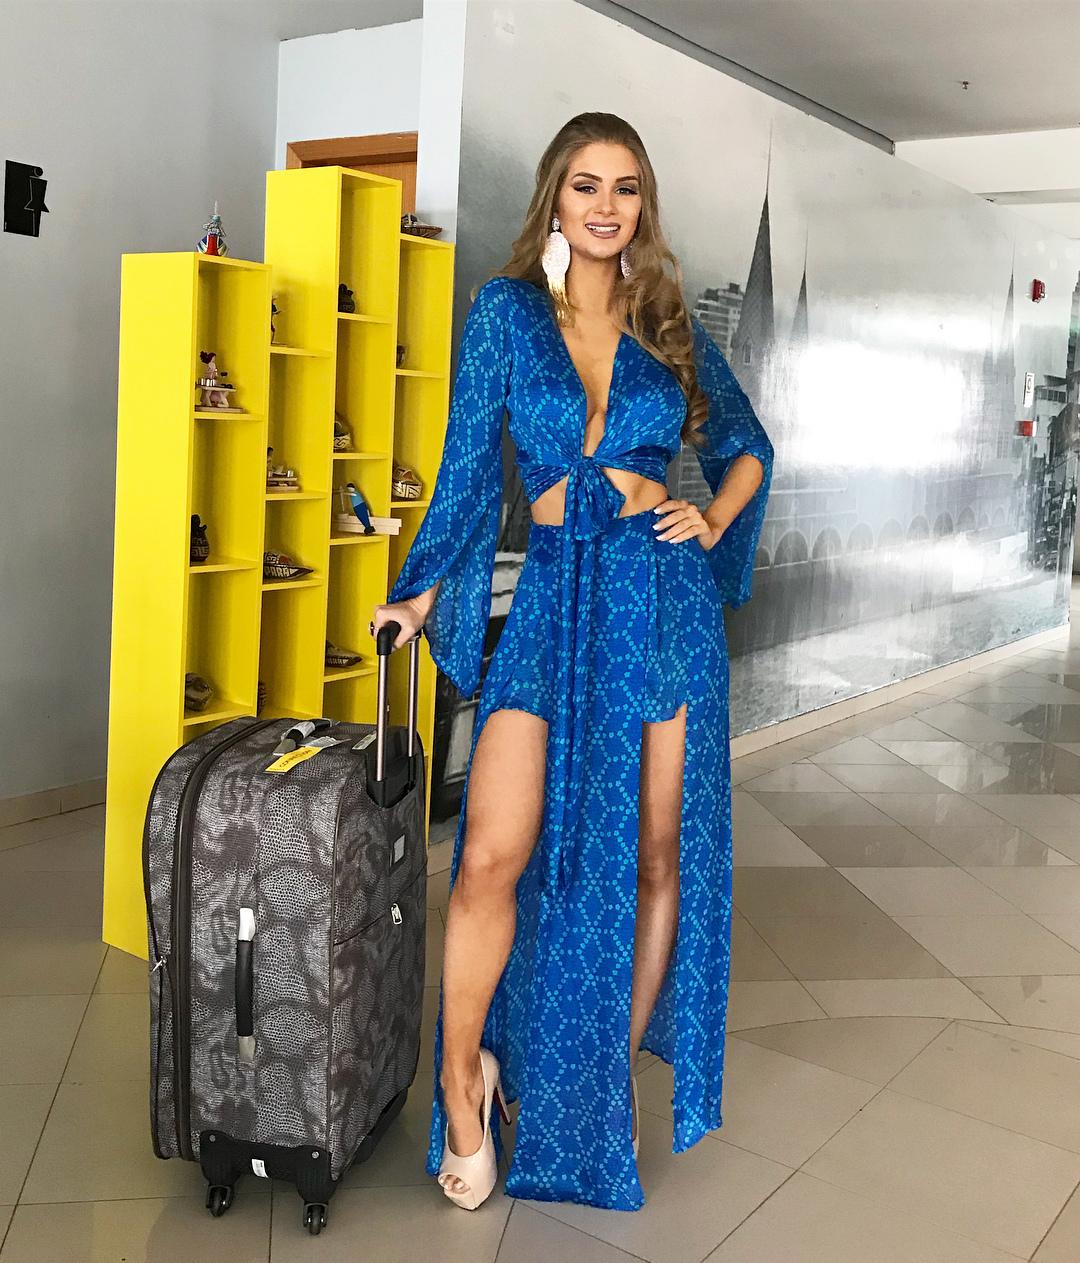 gabriela palma, miss brasil empresarial 2018. - Página 3 37813911